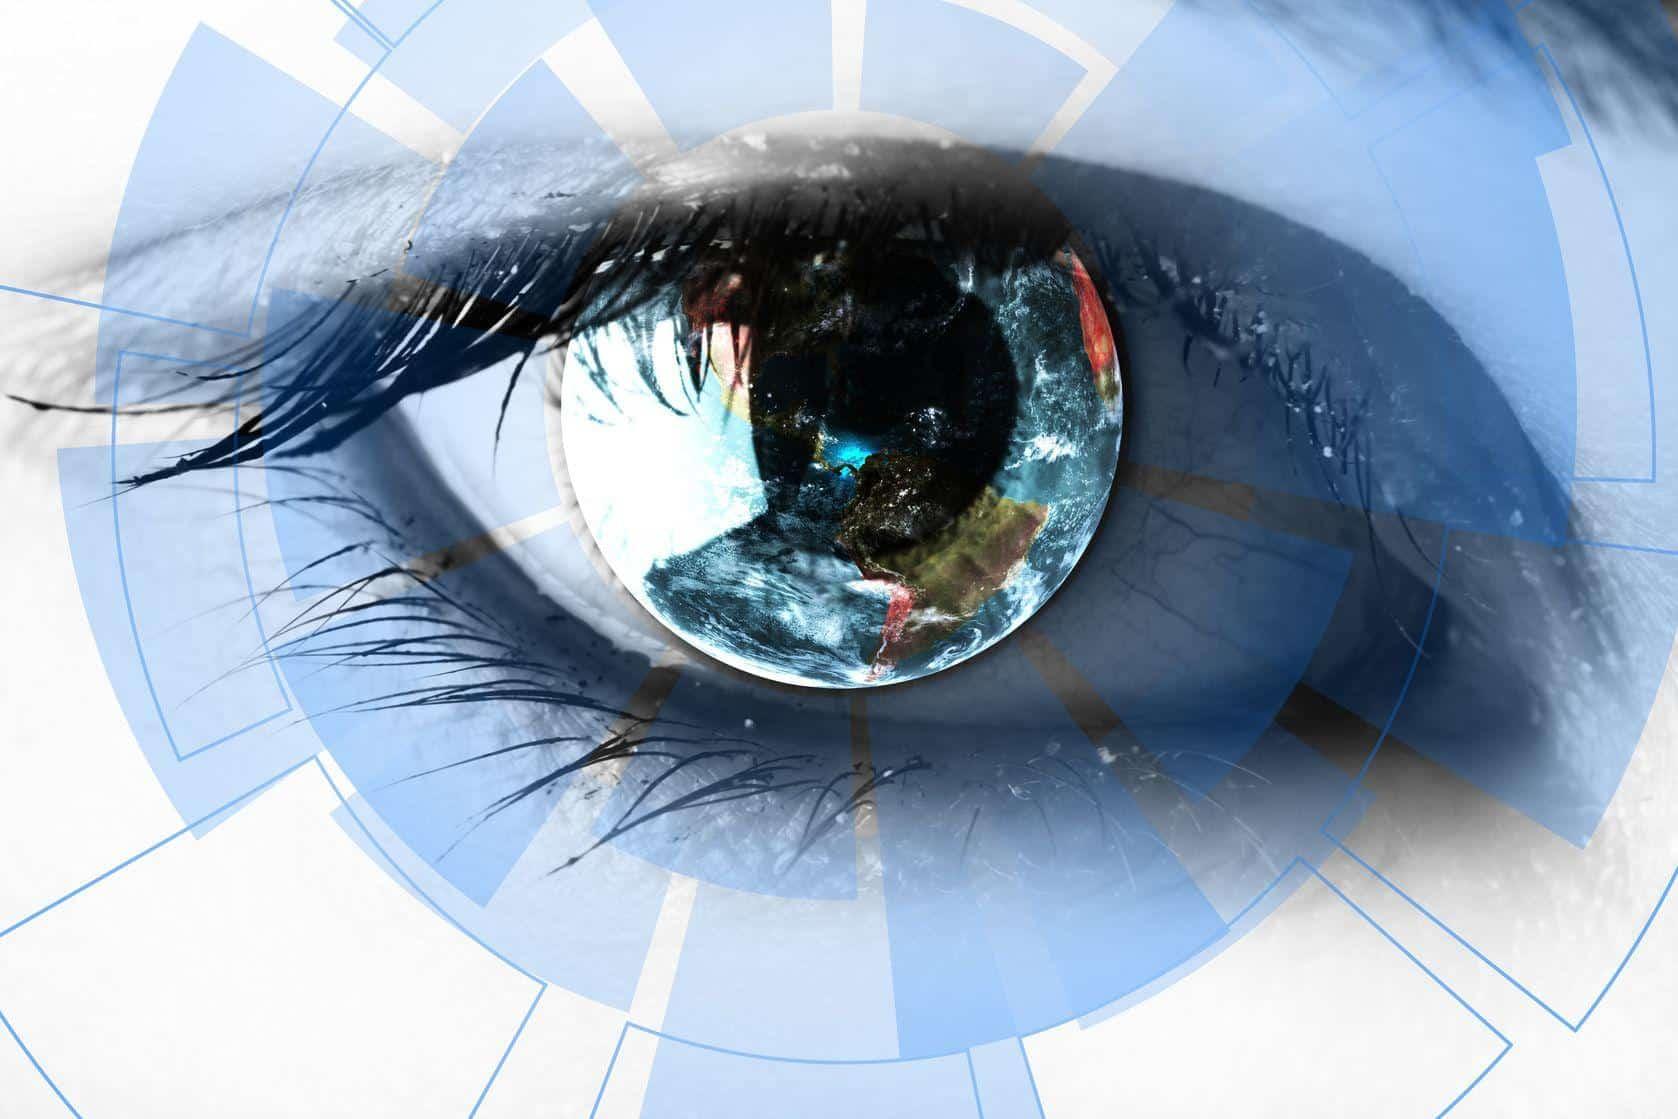 Blurred Vision Symptoms